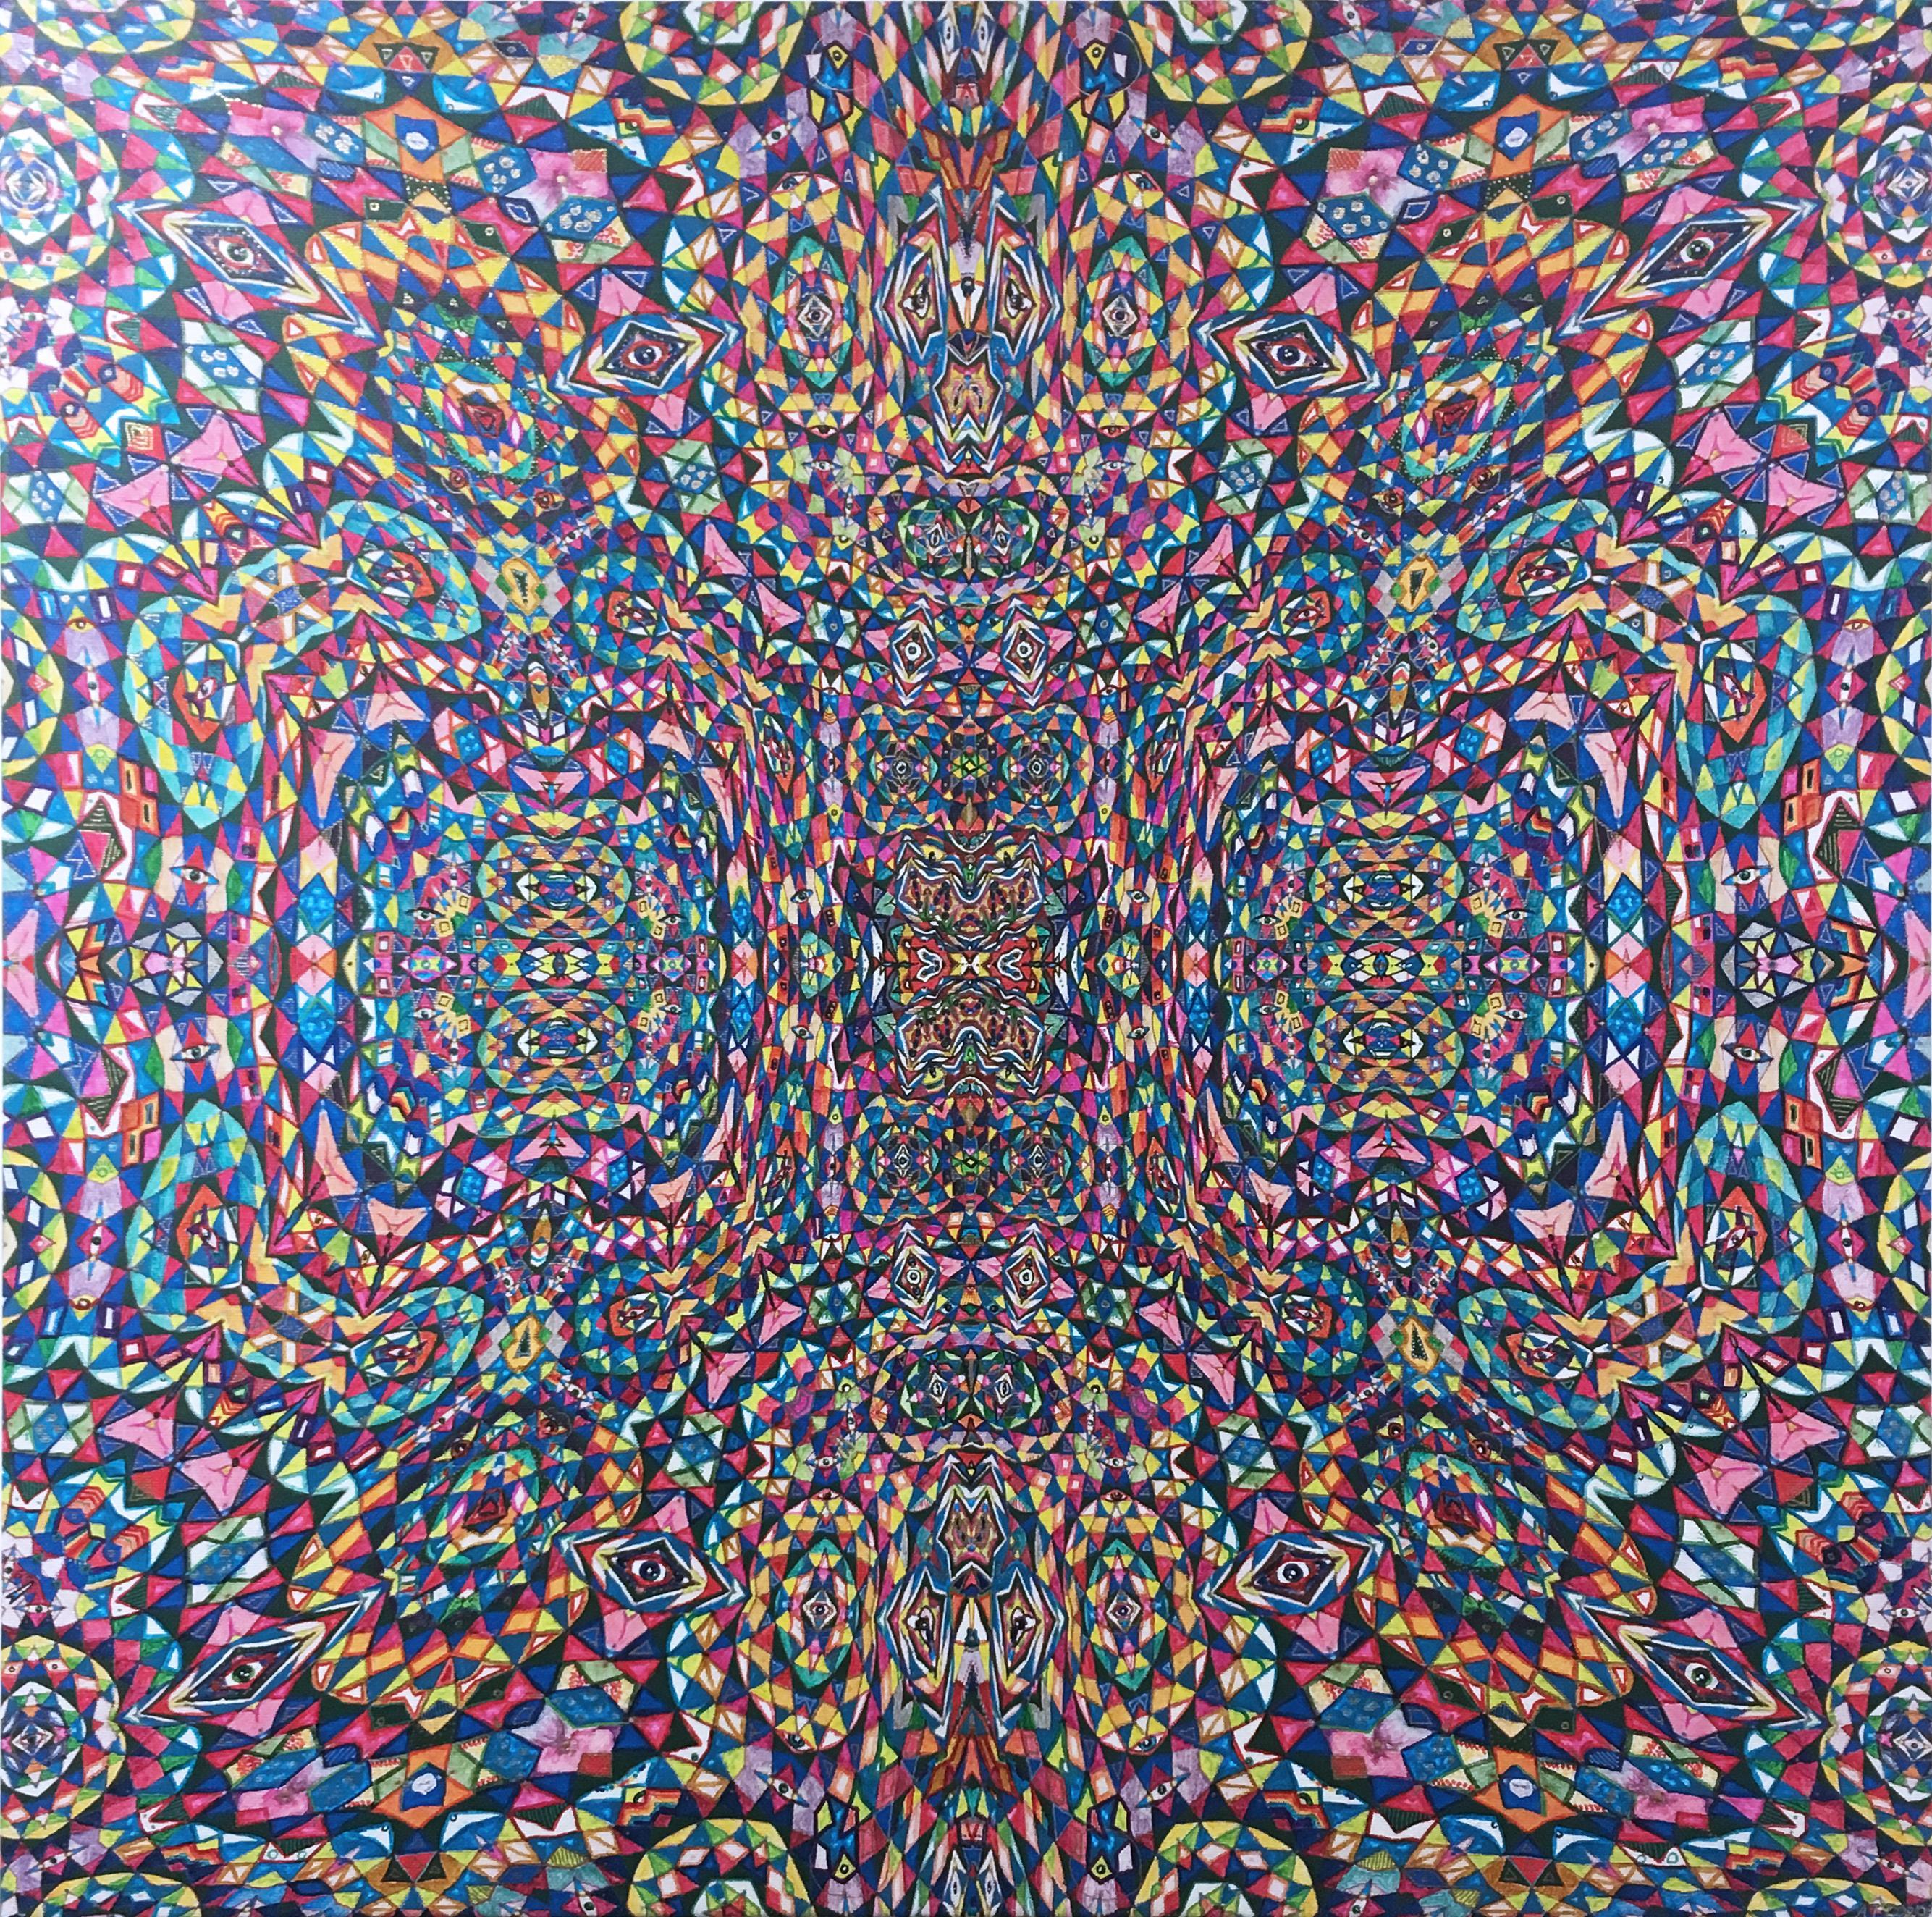 Totem, 2020, acrylic, oil, marker, liquid gold leaf, op-art, pattern, red, blue